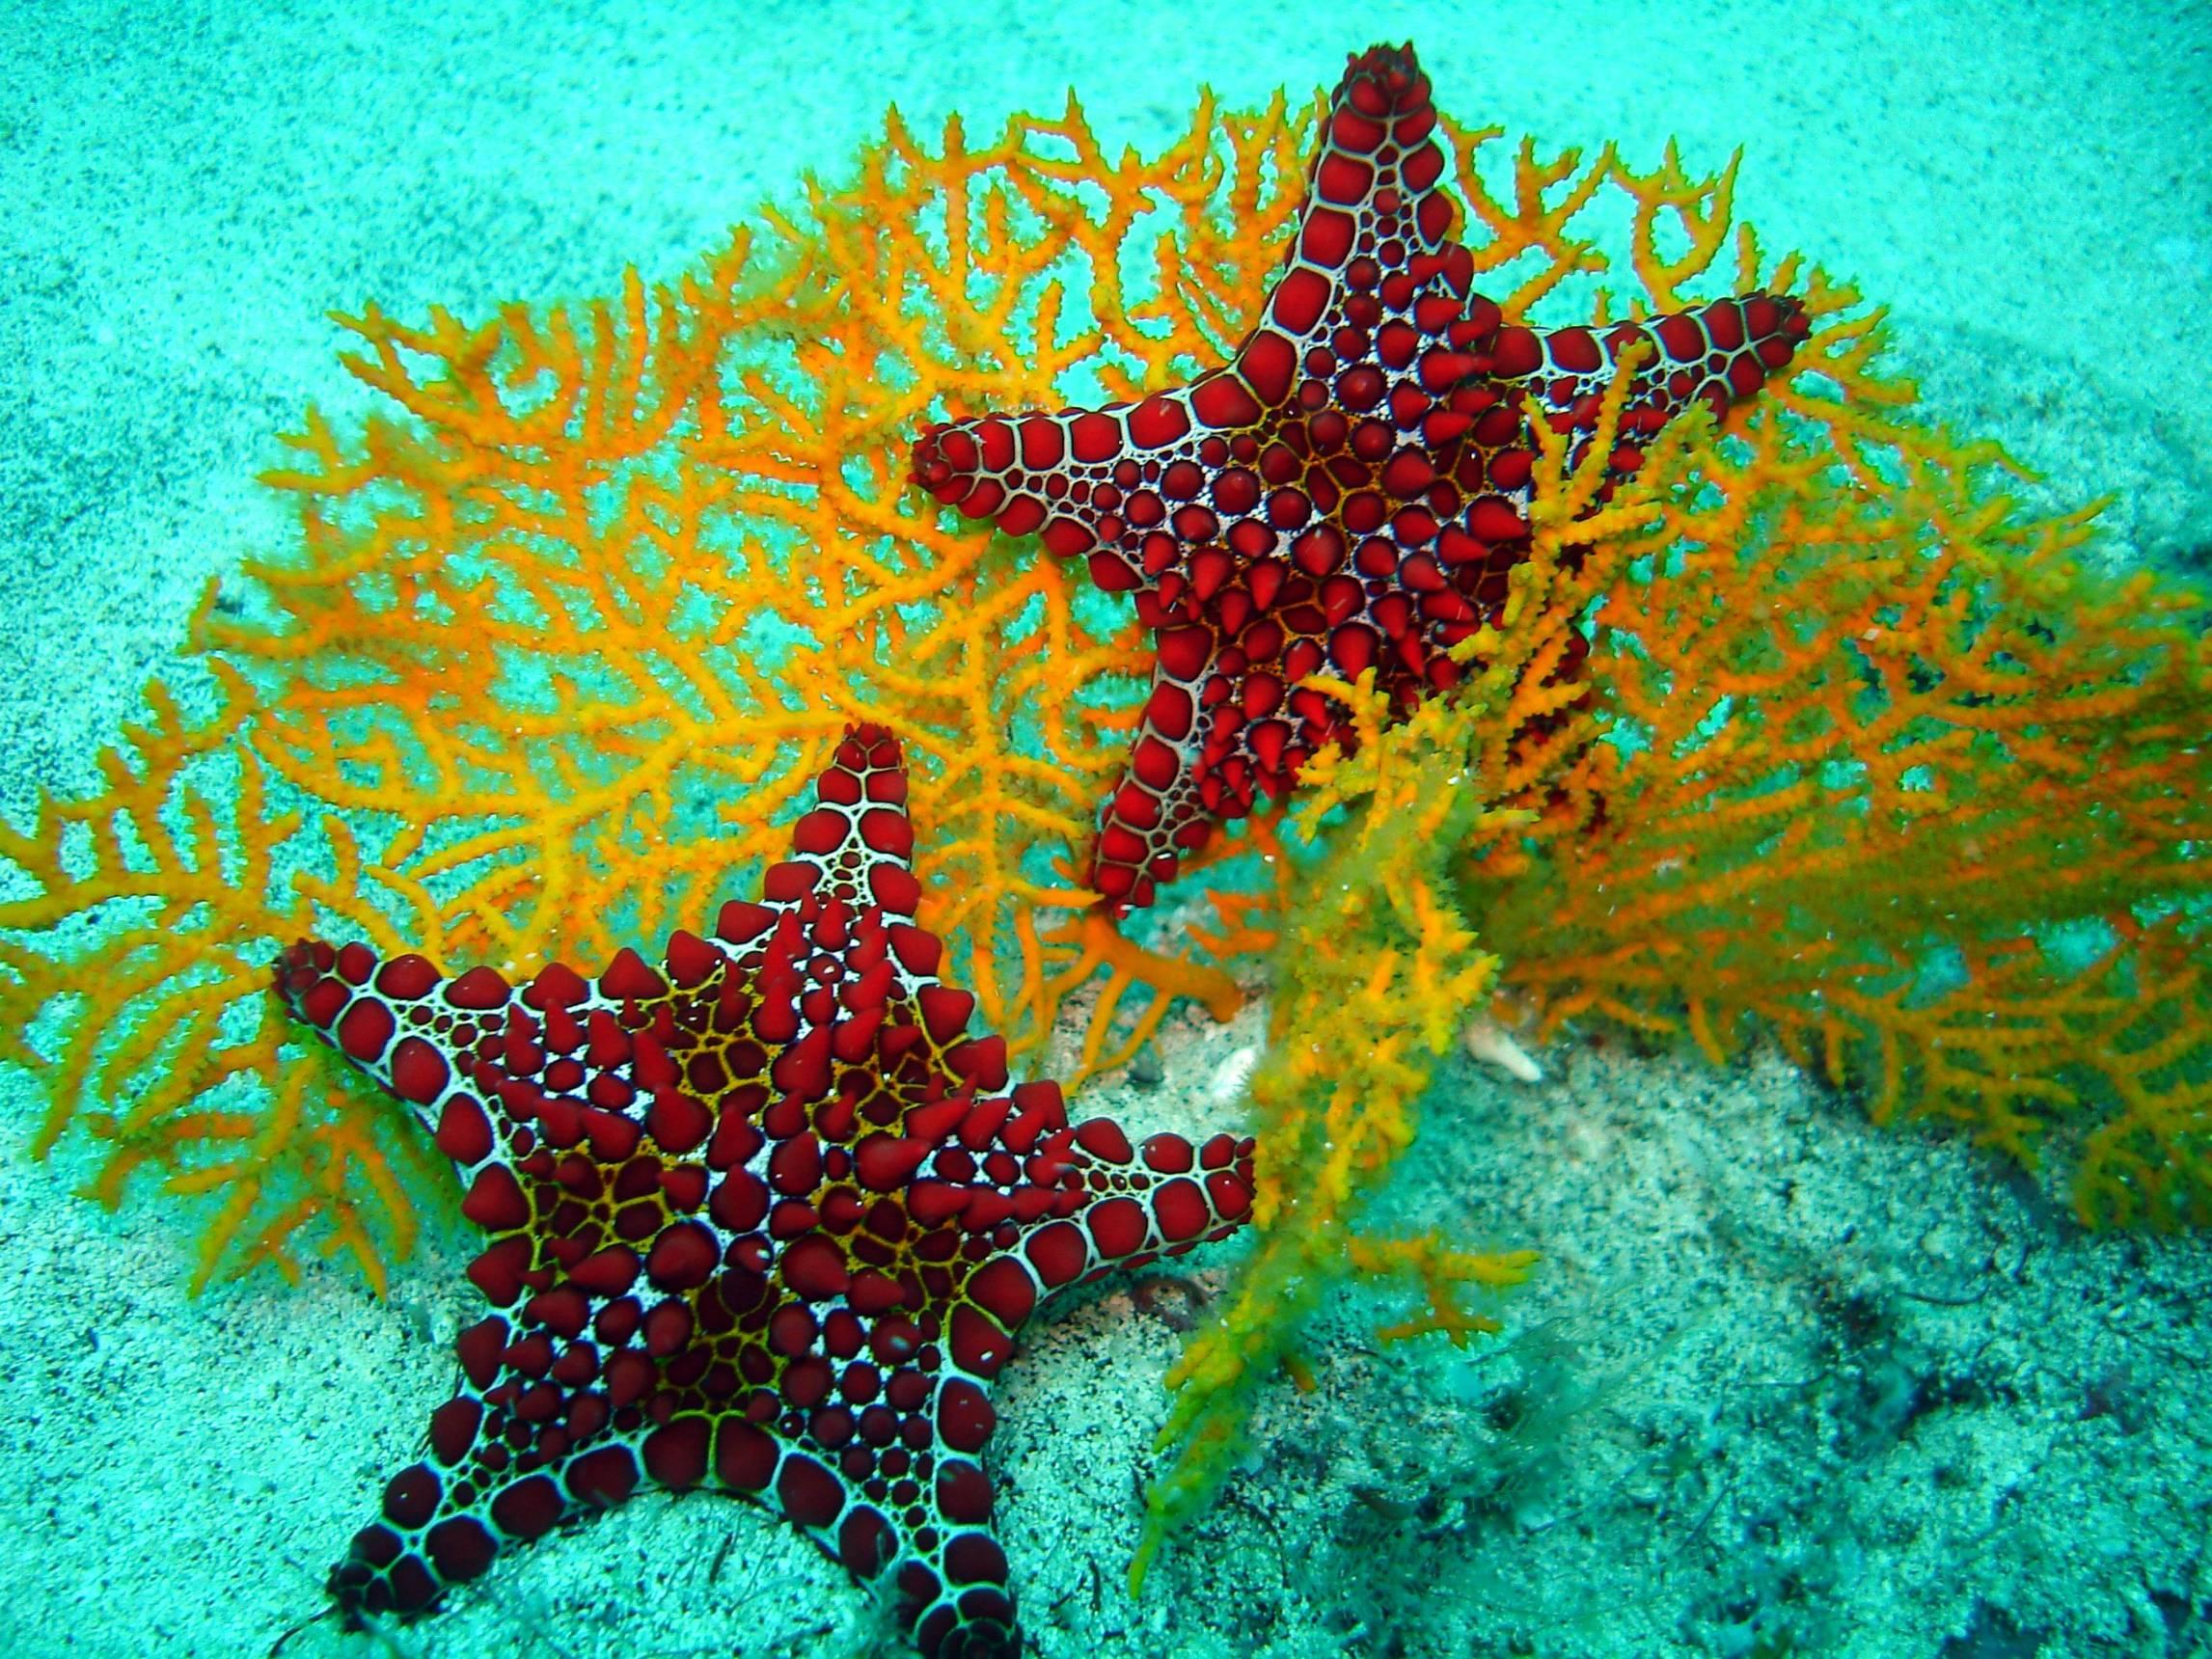 Star and Yellow Coral   Tropical FishUnderwater Sea Life Wallpaper 2293x1720